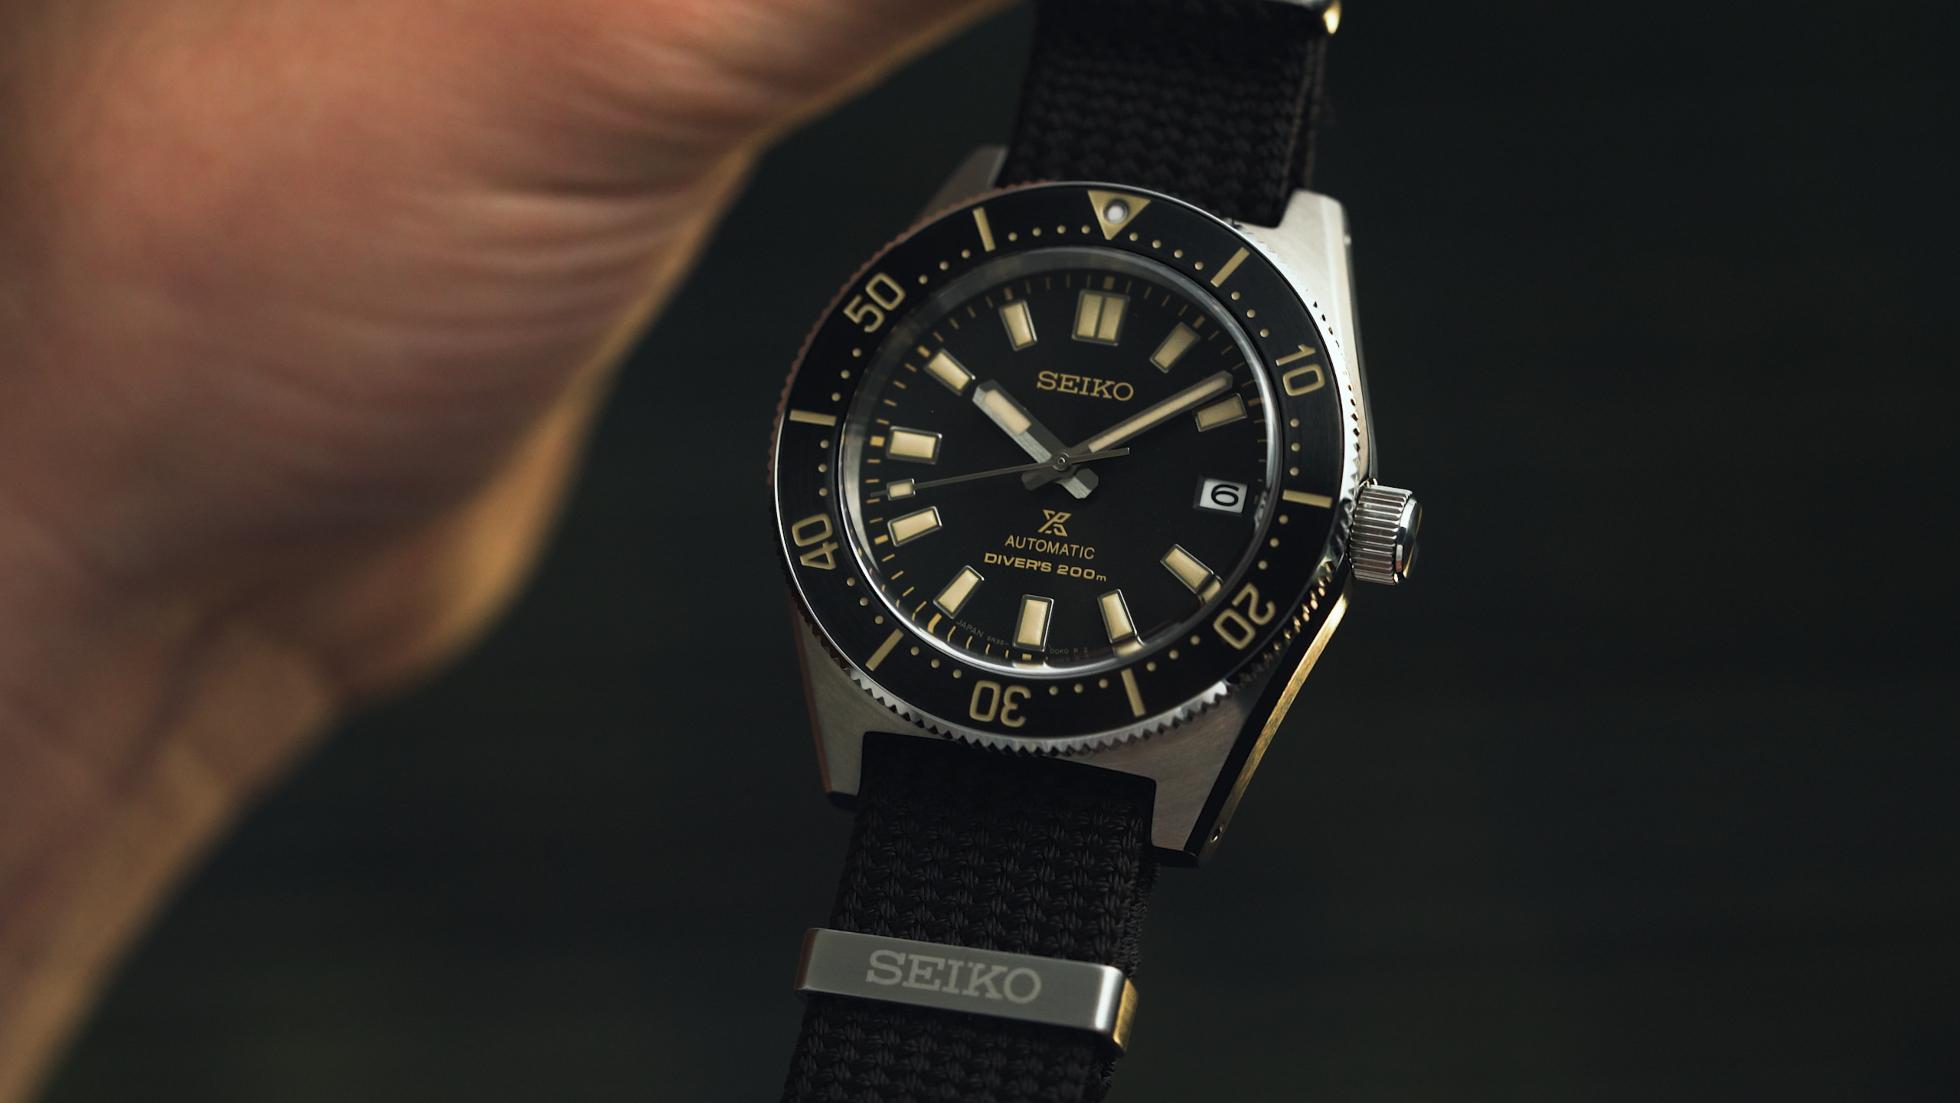 The Seiko SPB239J is a retro-styled crowd pleaser